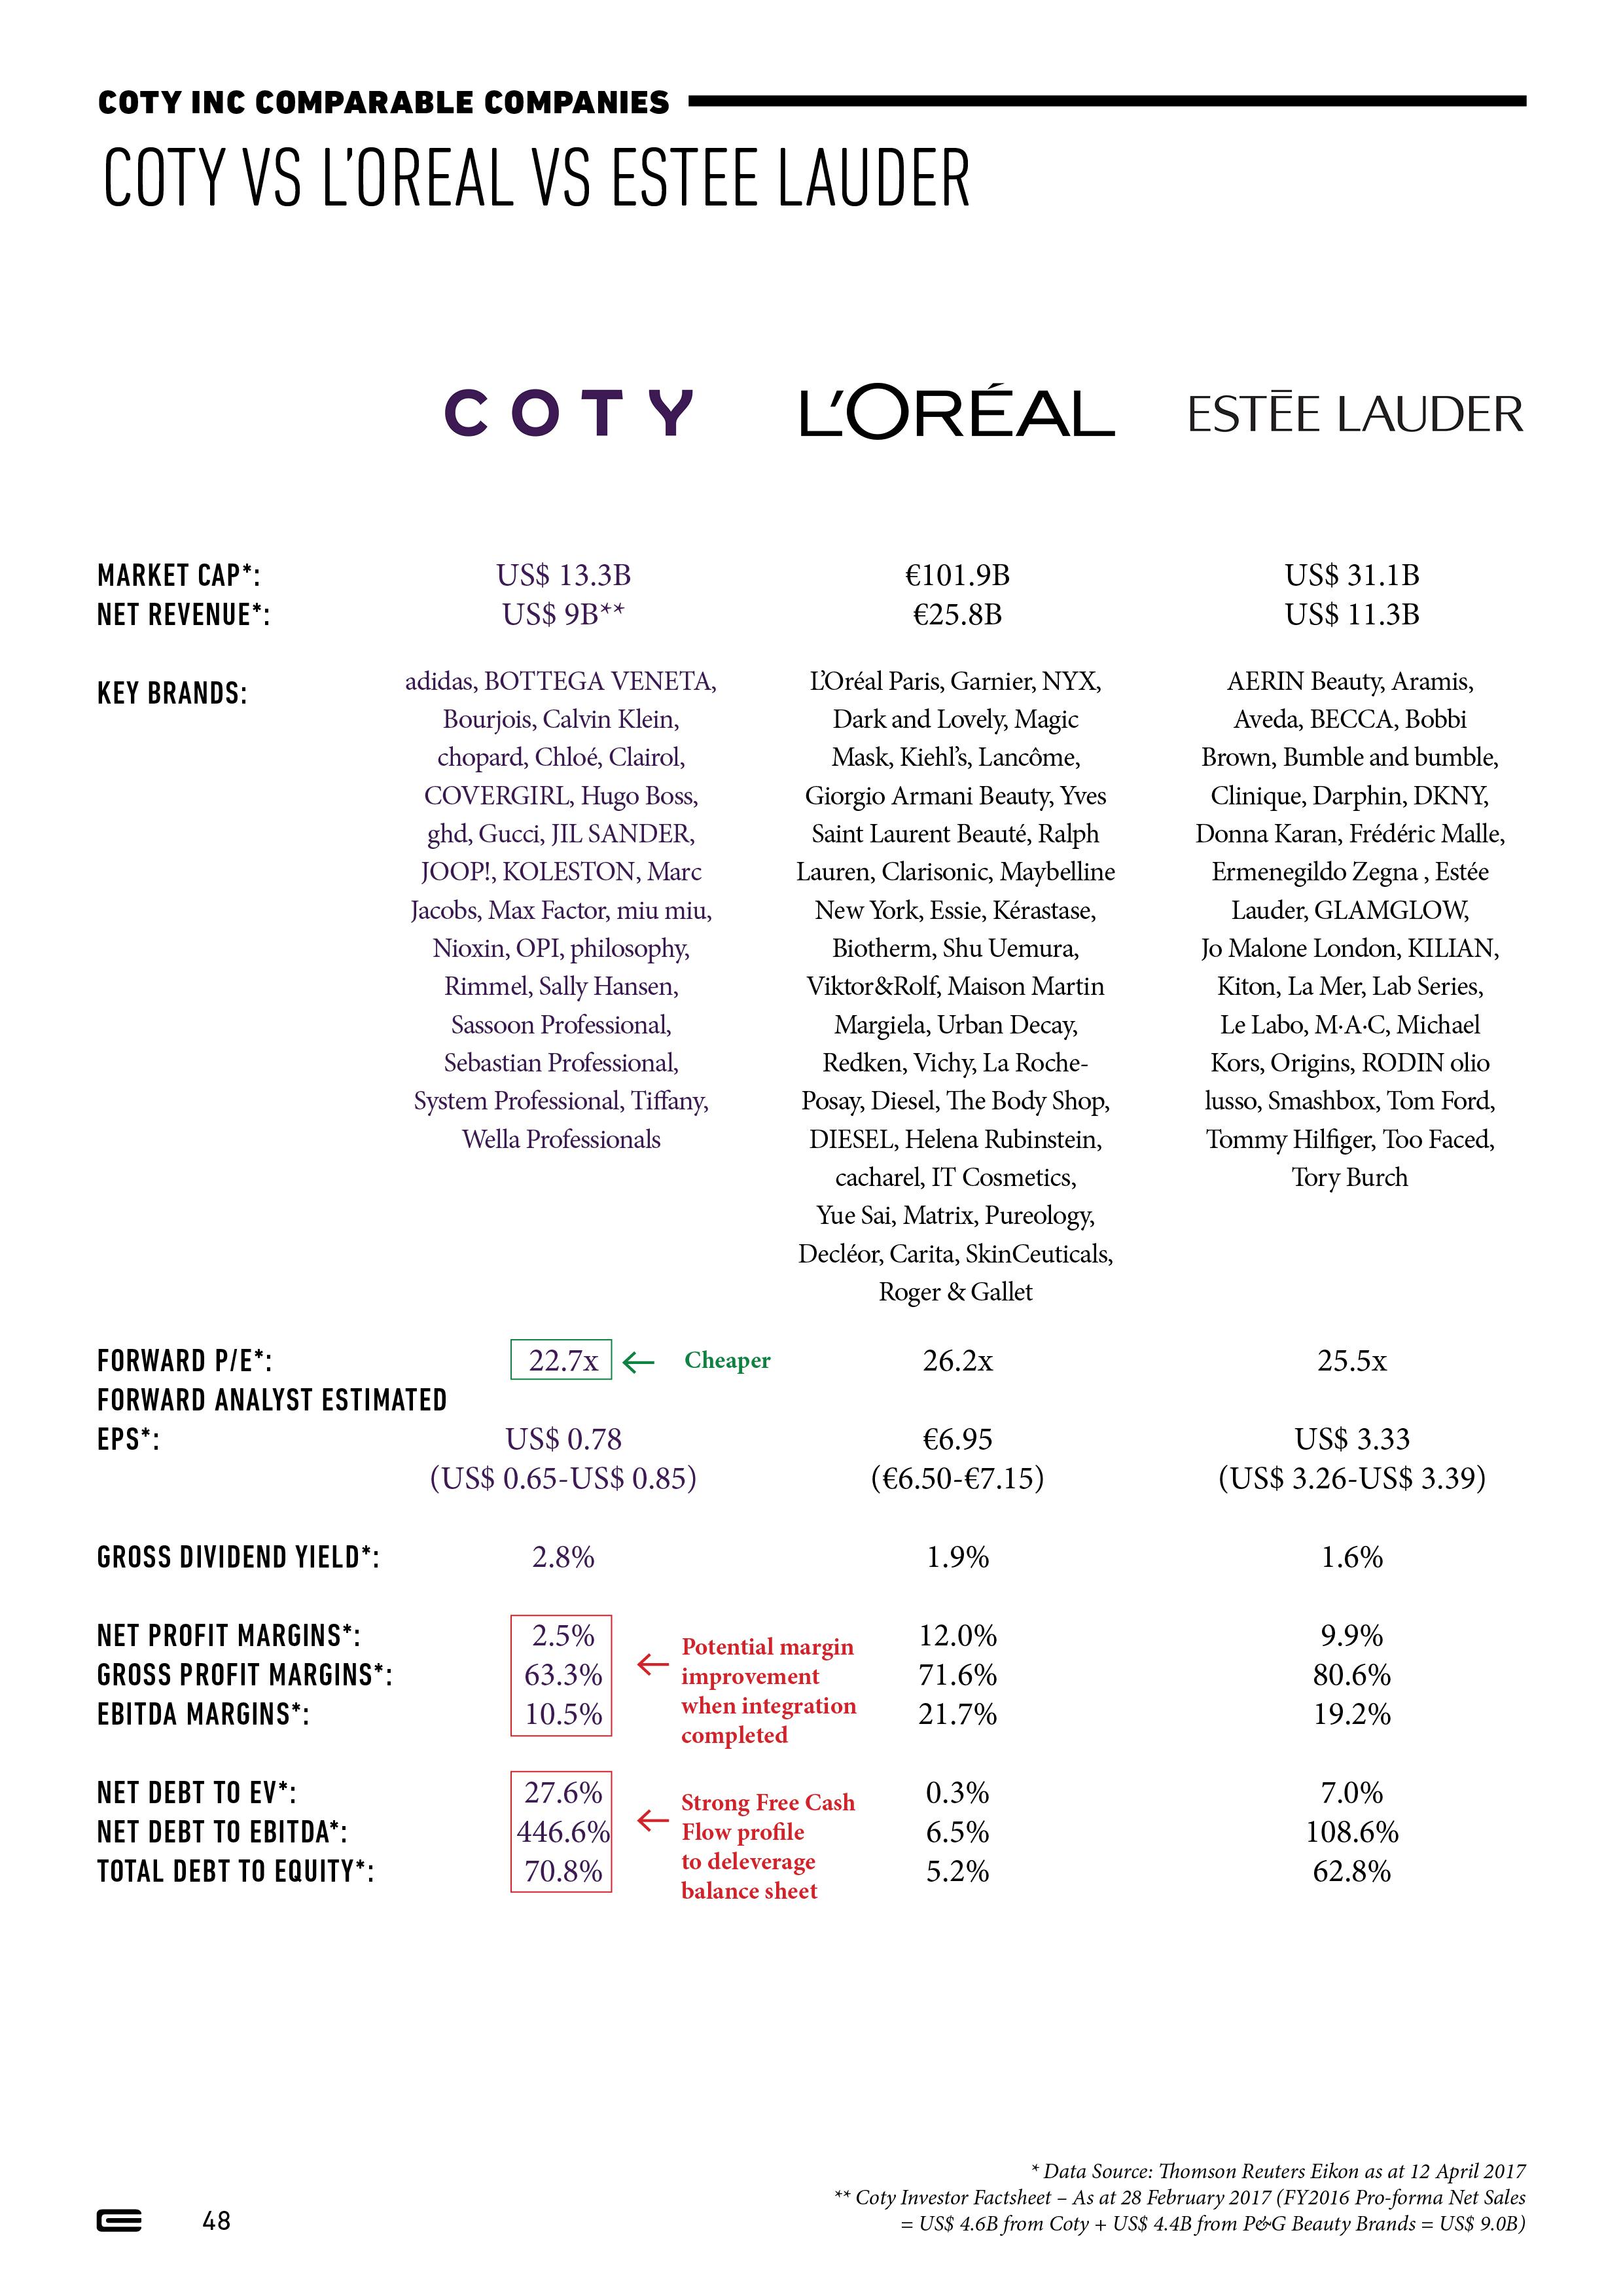 Coty48.jpg